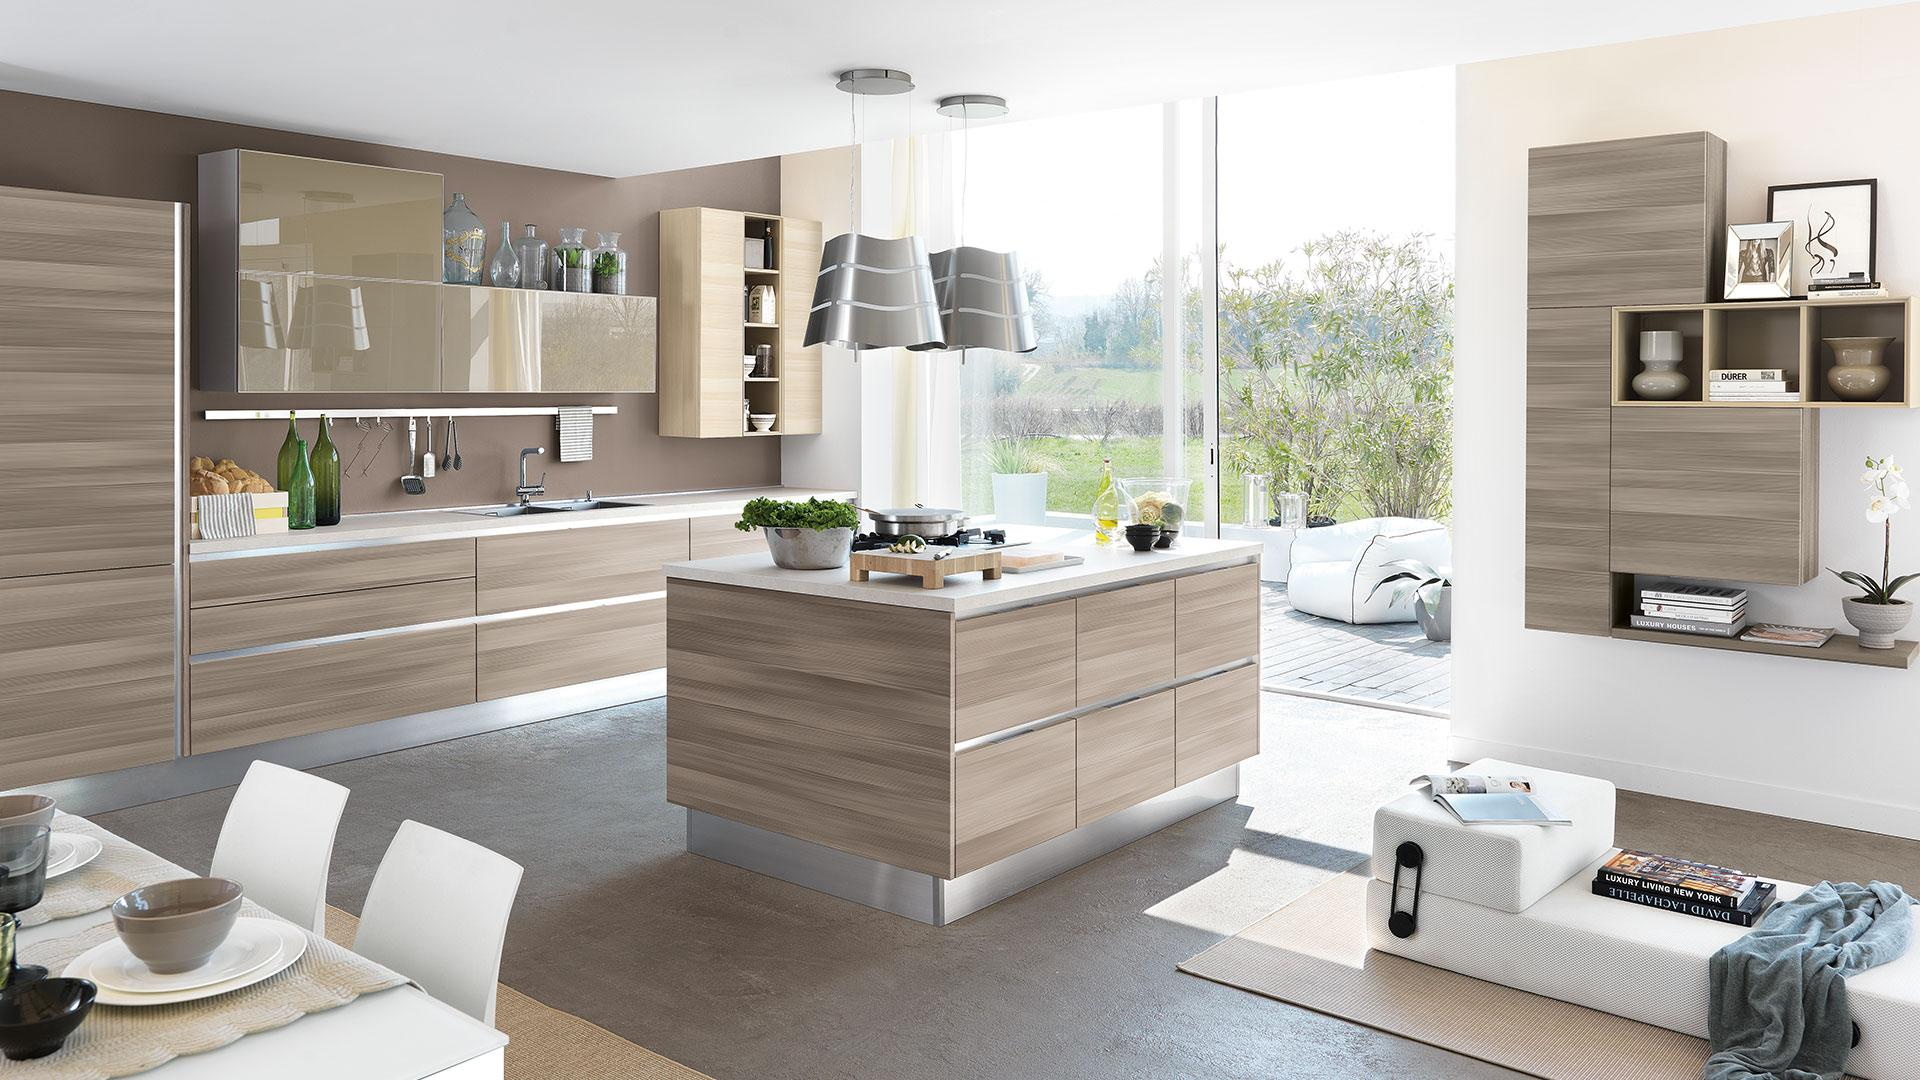 Cucina moderna_4